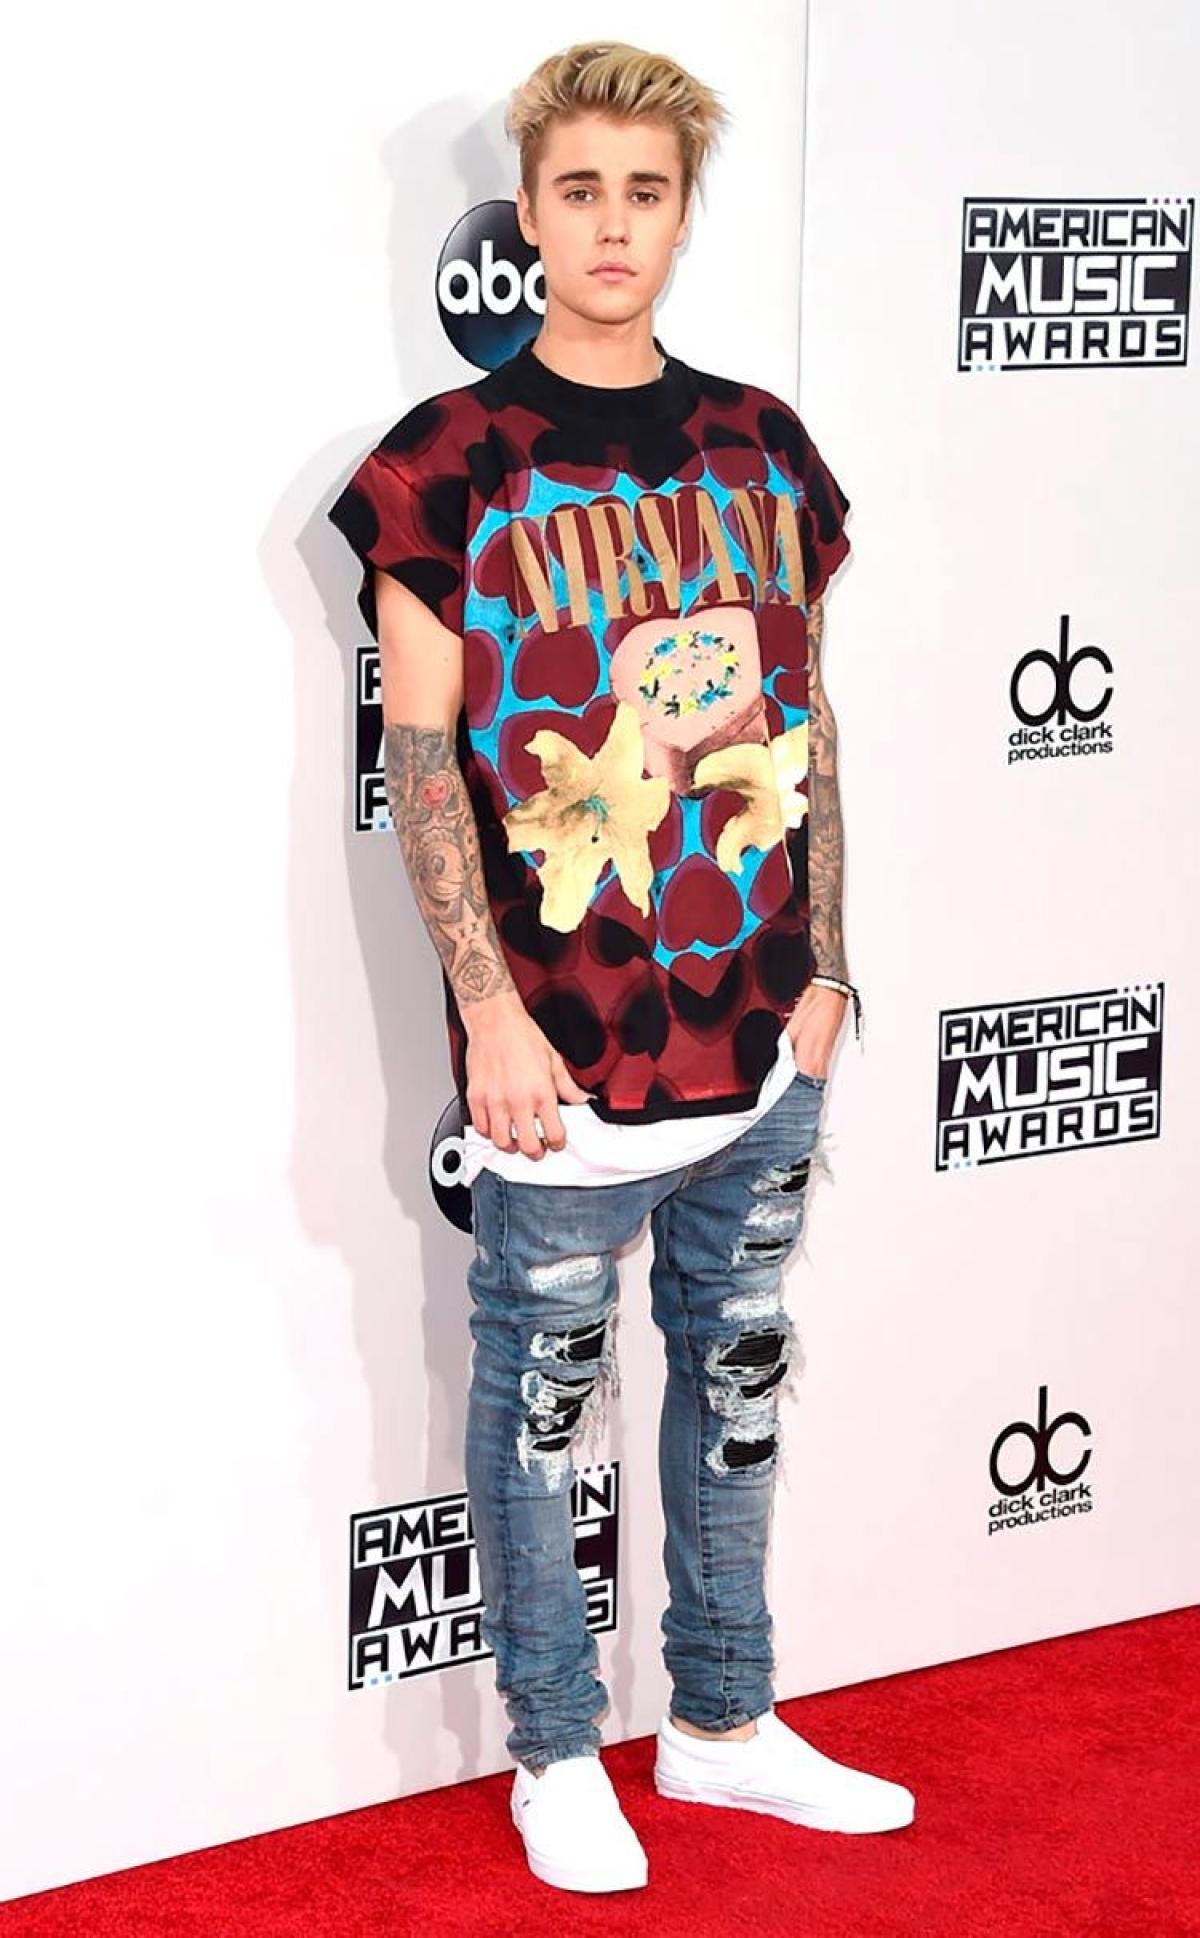 Justin Bieber rocks a graphic T-shirt